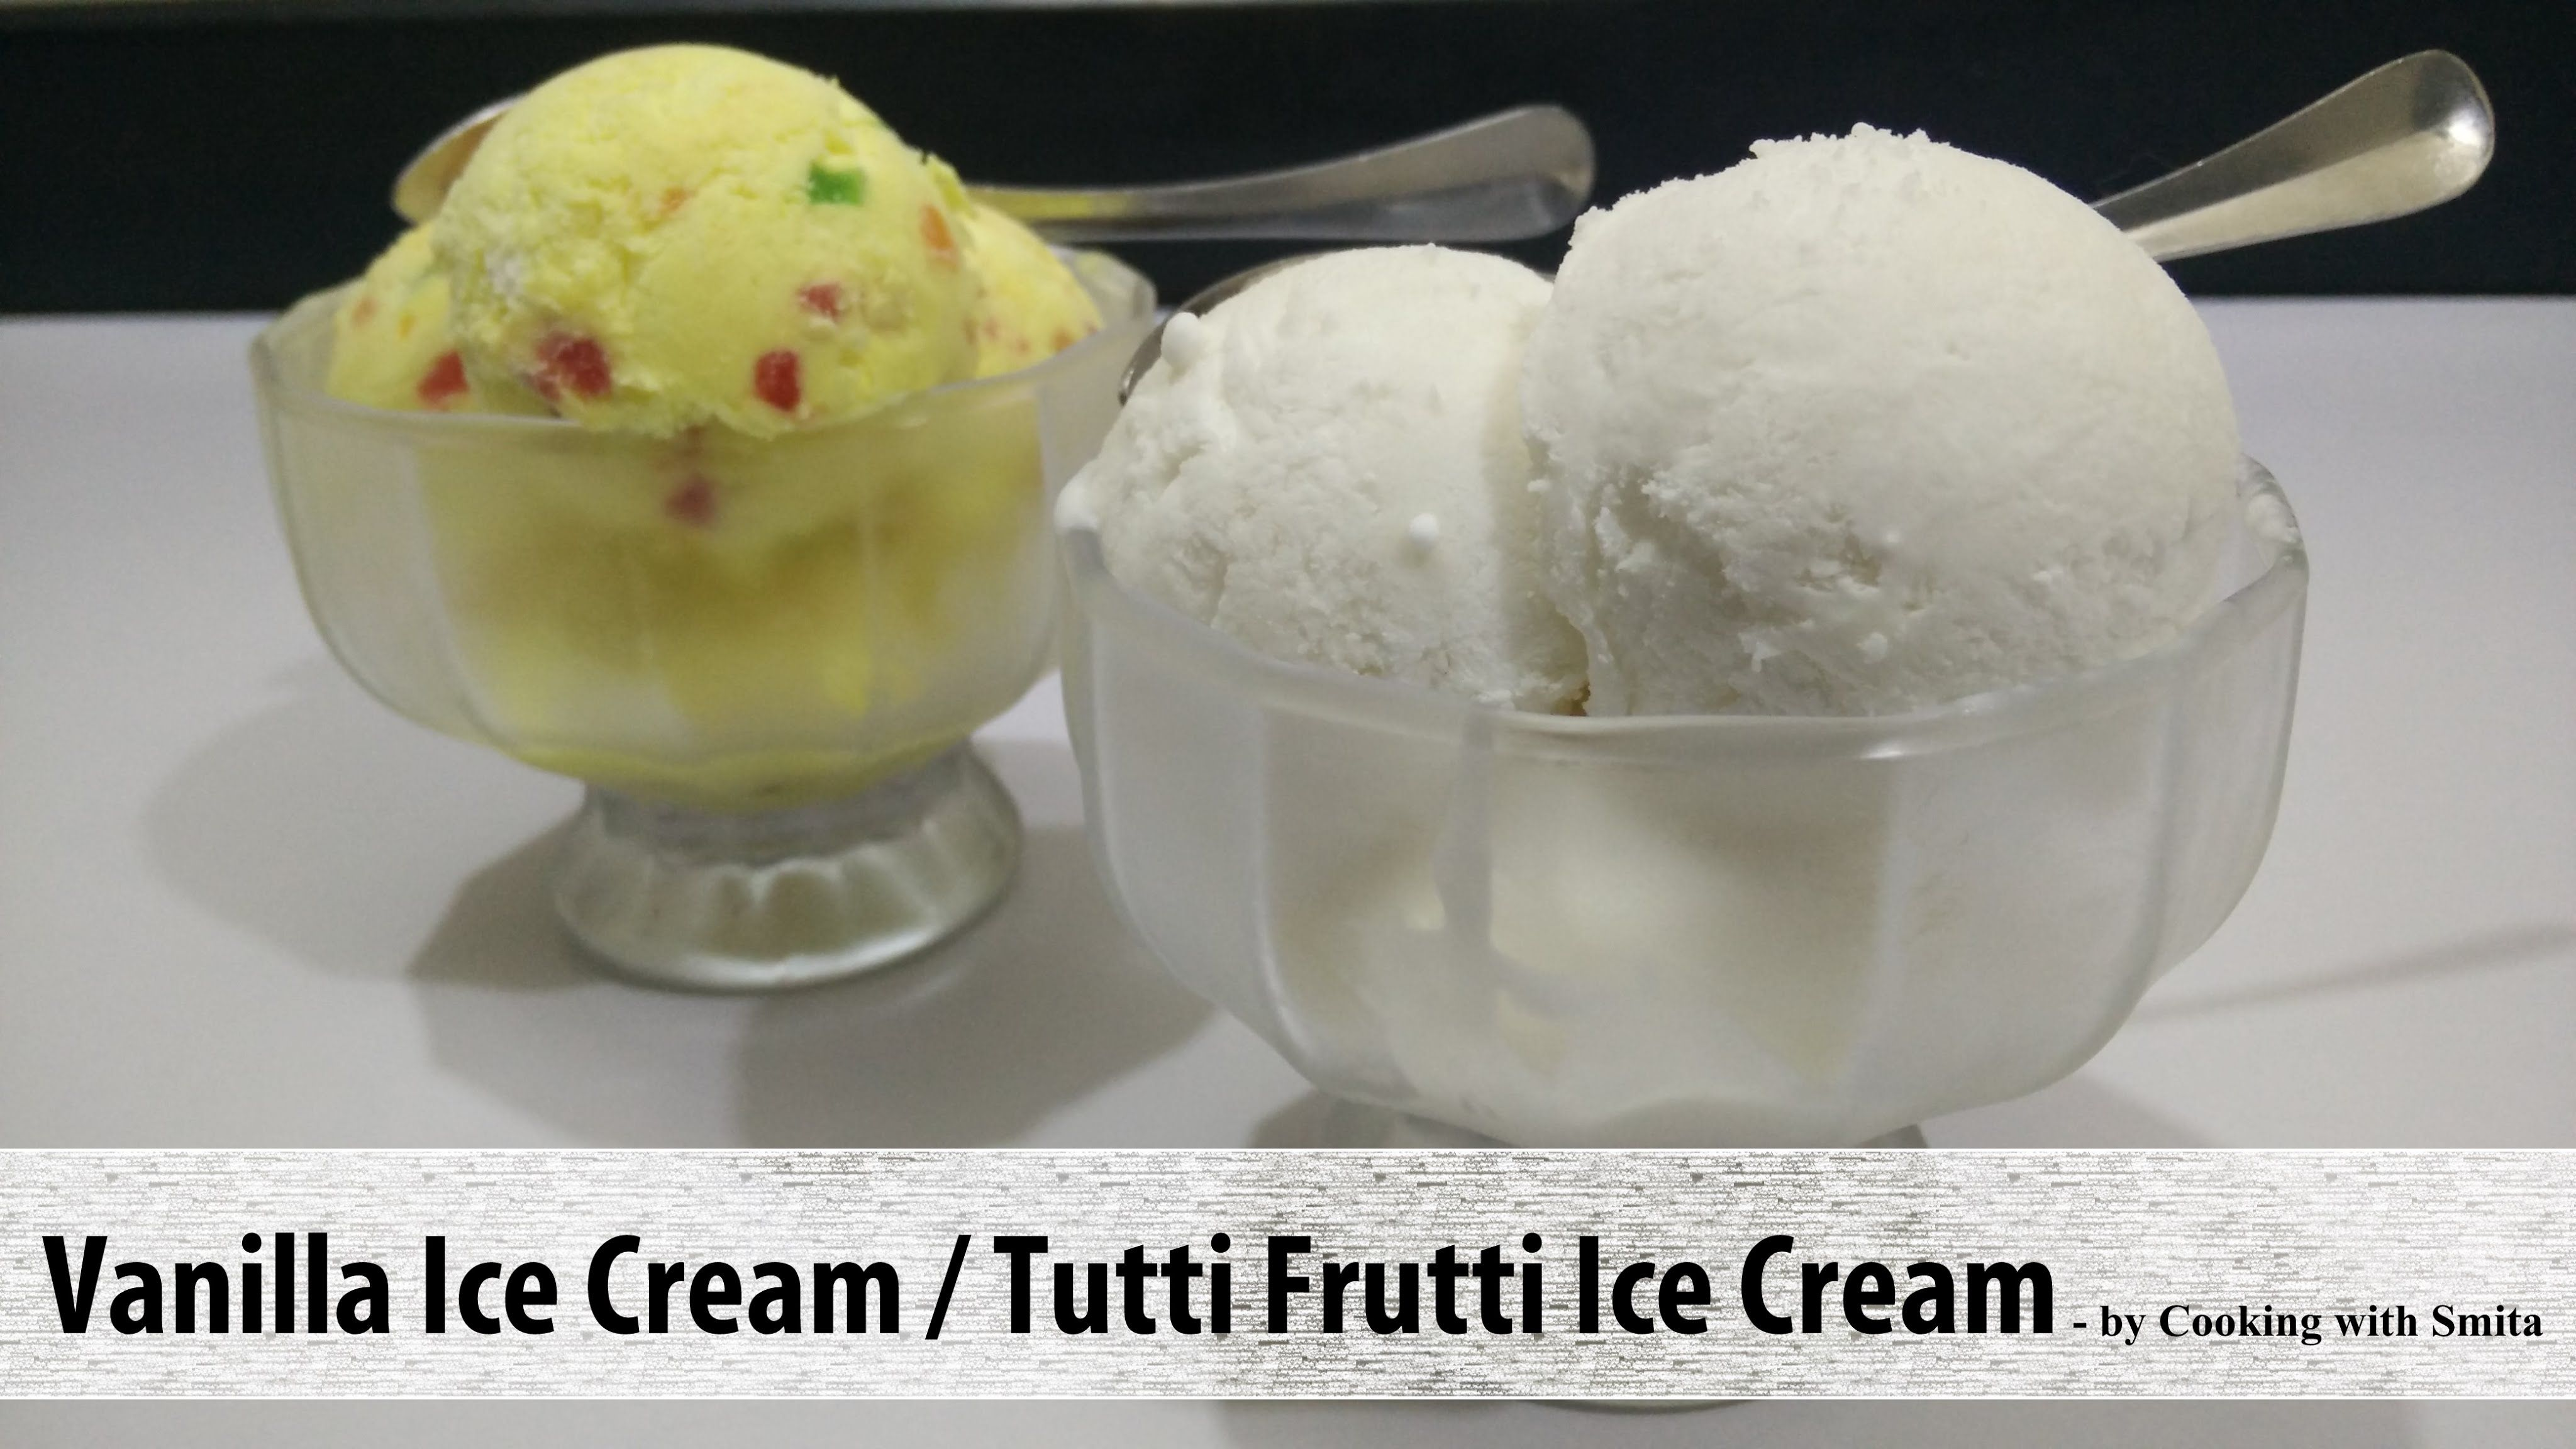 Eggless vanilla ice cream tutti frutti ice cream recipe by cooking eggless vanilla ice cream tutti frutti ice cream recipe in hindi by cooking with smita ccuart Choice Image